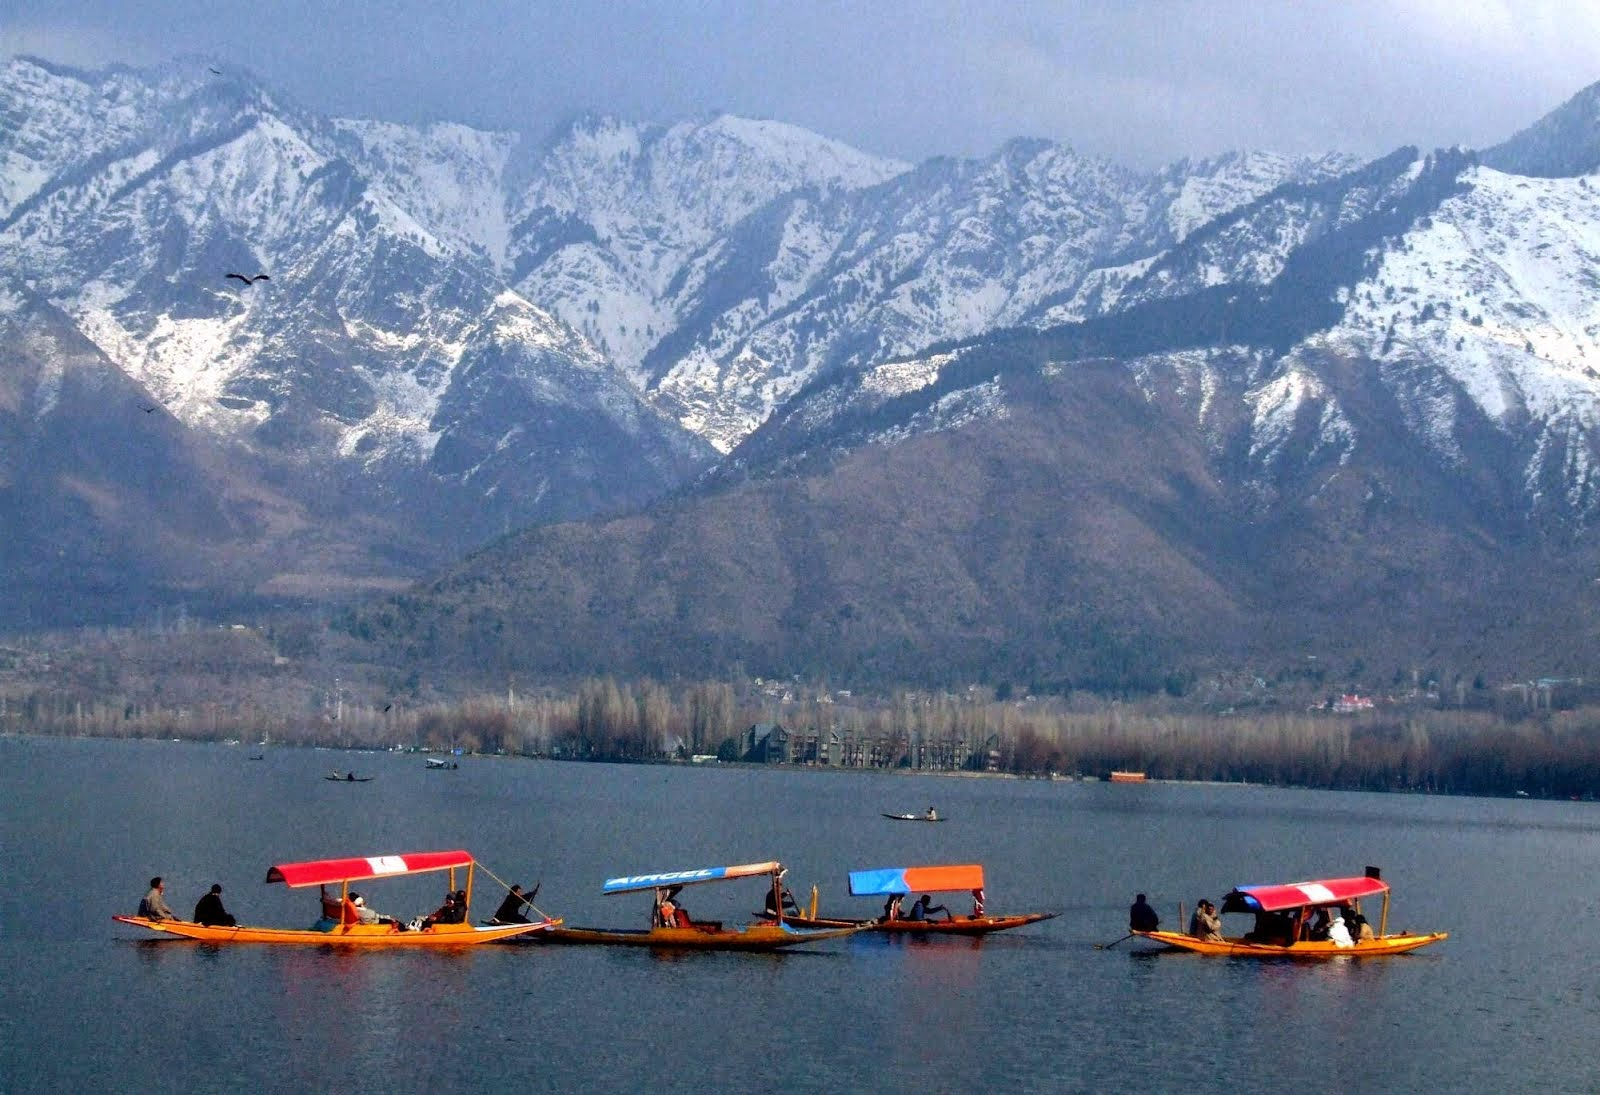 http://www.getbookcab.com/Admin/images/Srinagar.jpg